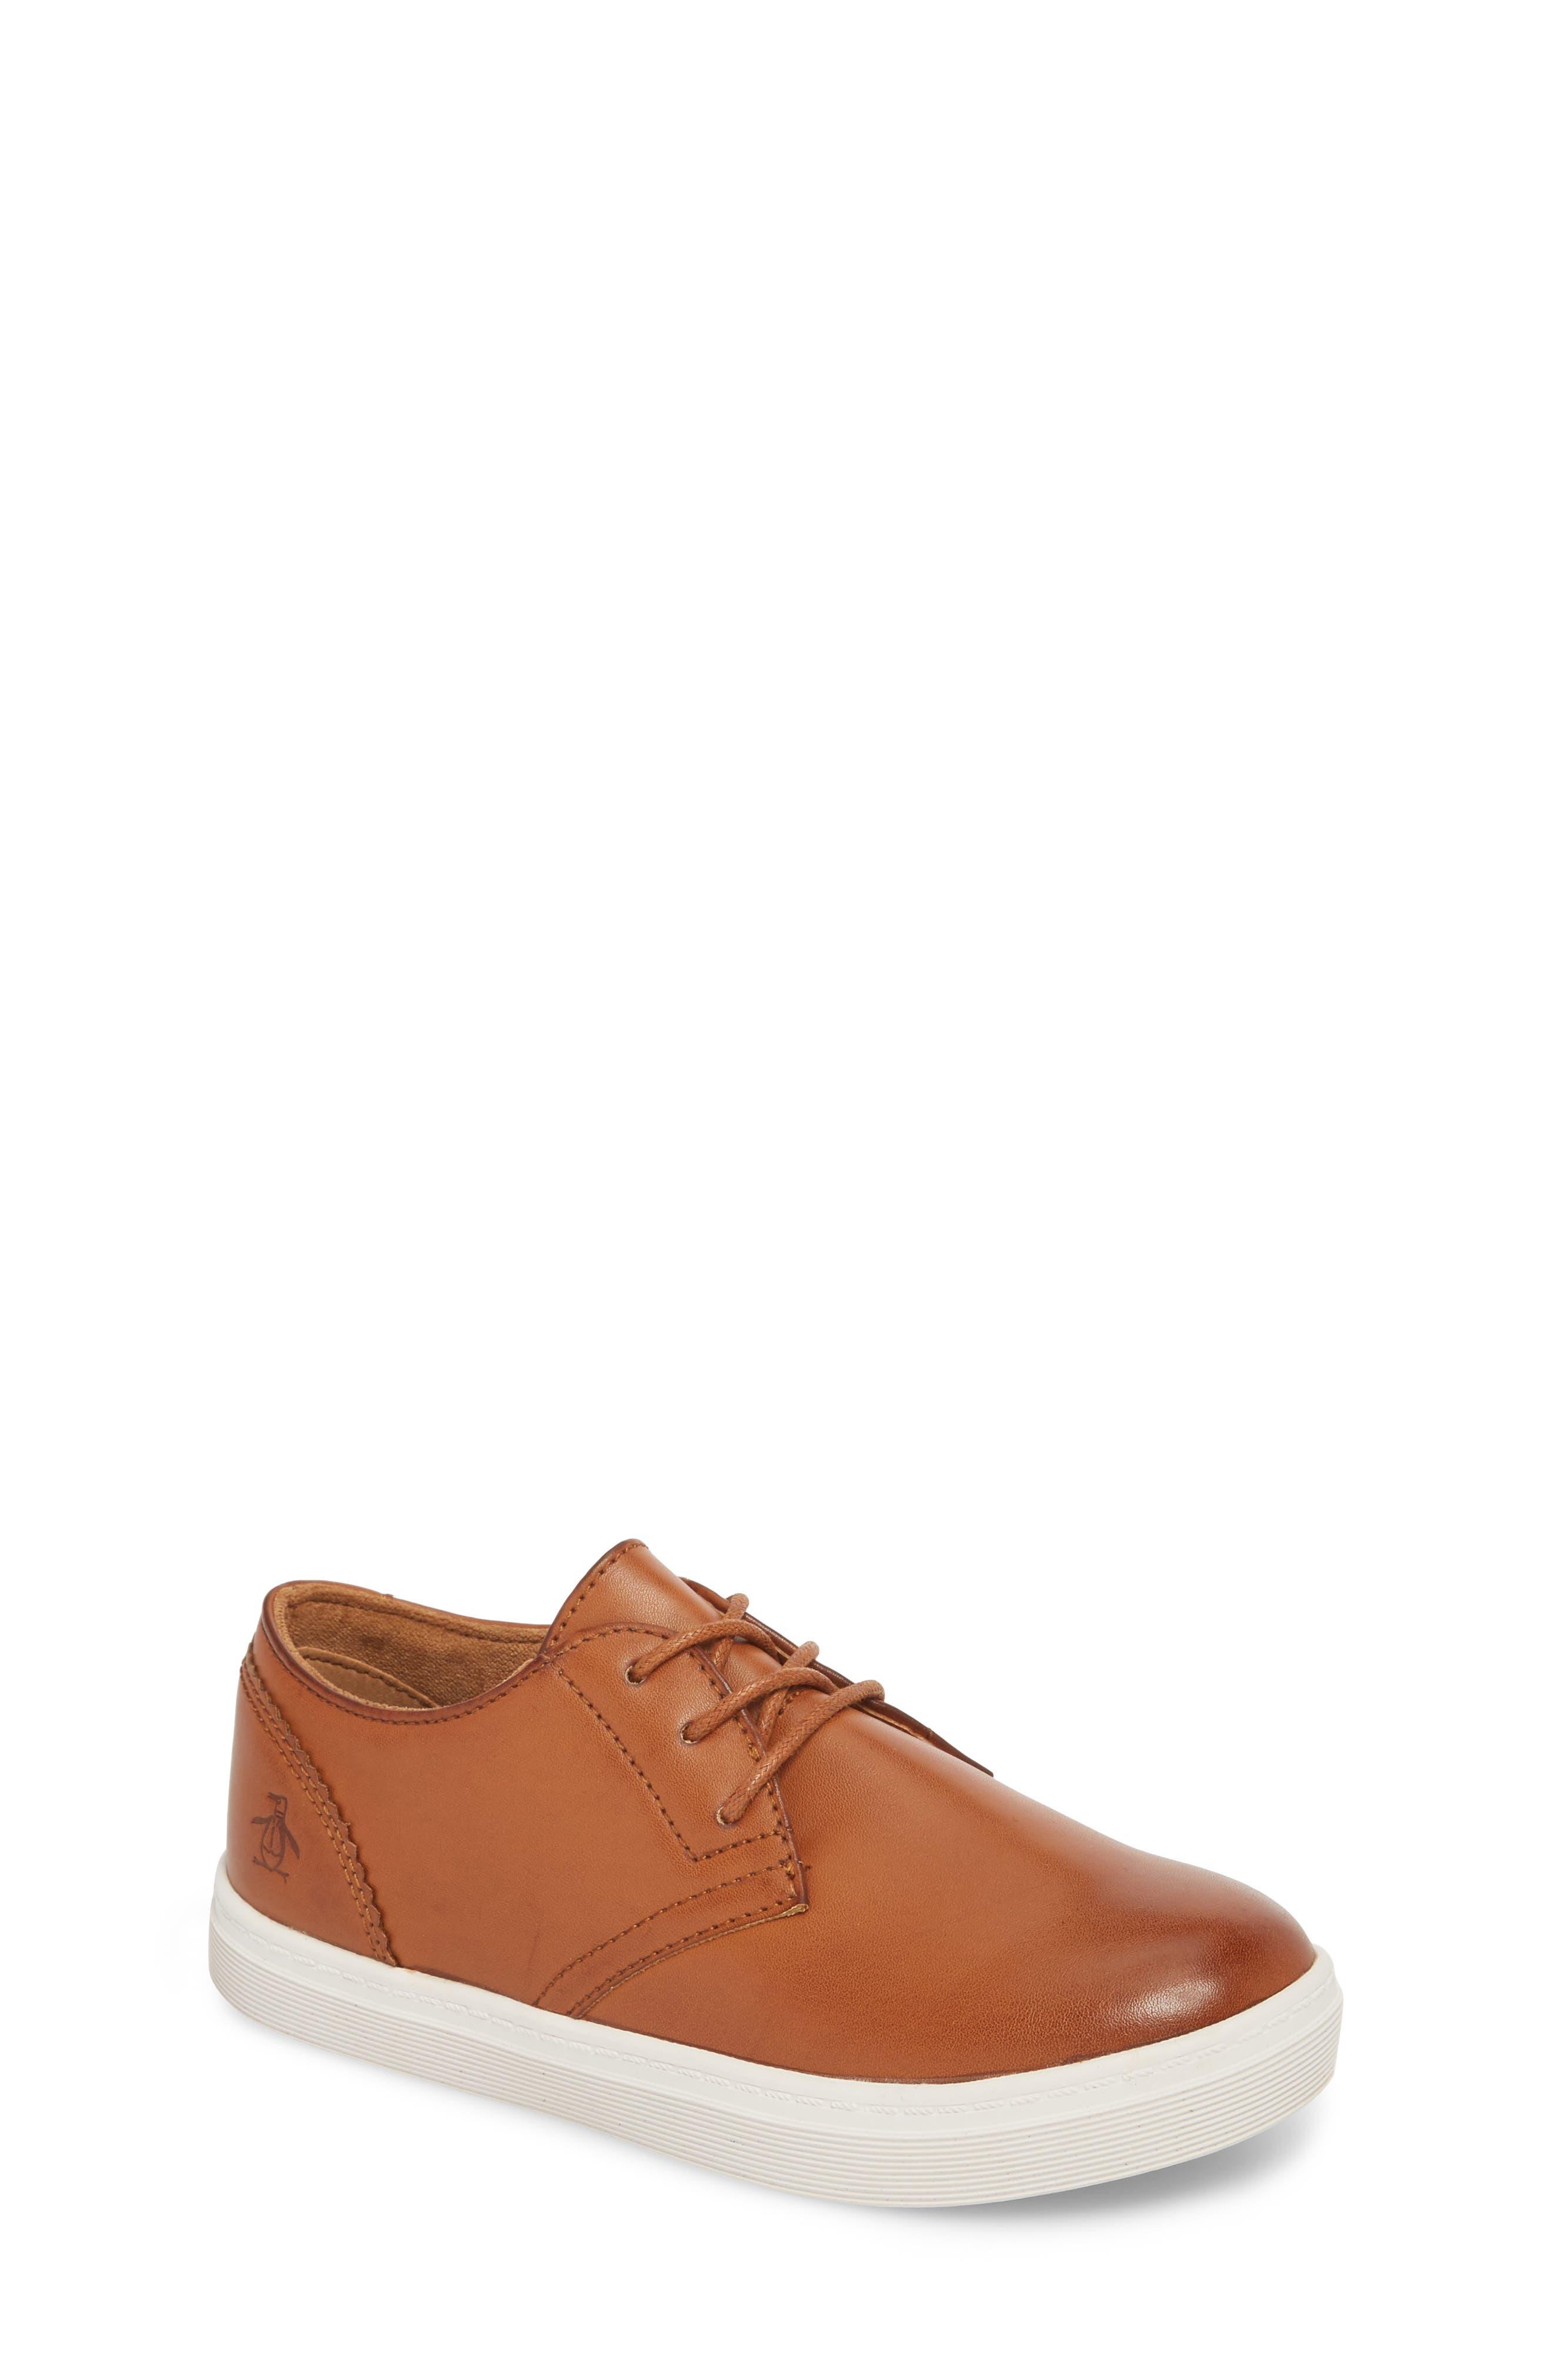 ORIGINAL PENGUIN Freeland Sneaker, Main, color, COGNAC